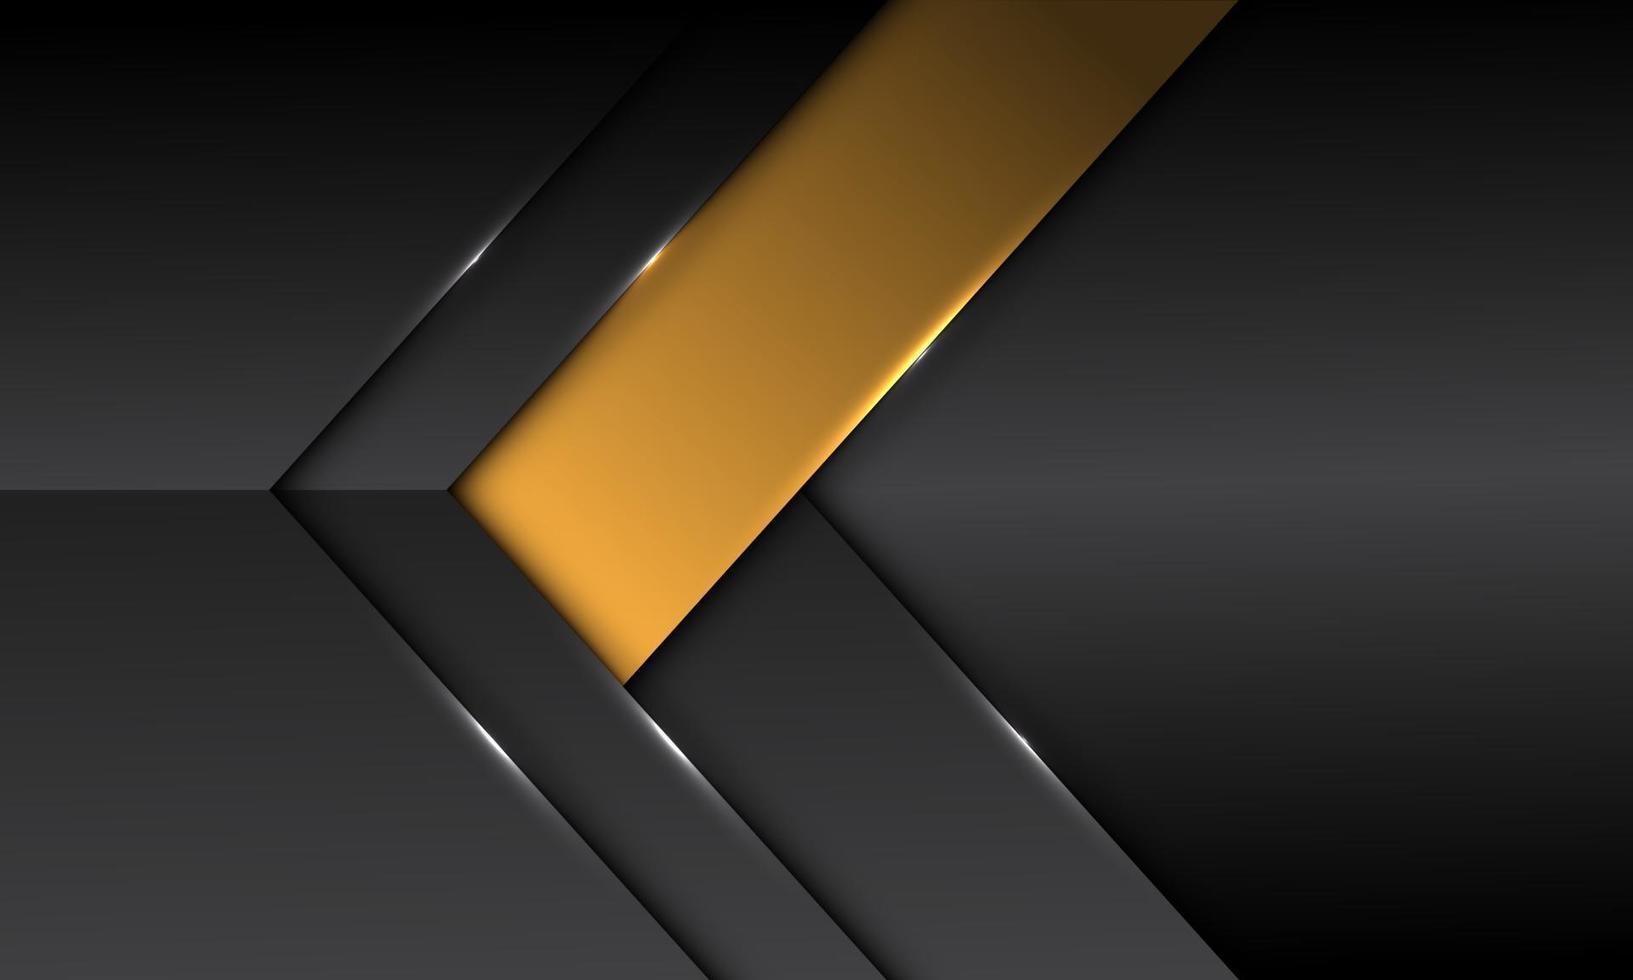 abstrakt mörkgrå metallisk gul bannerpilriktning med tomt utrymme design modern futuristisk bakgrundsvektorillustration. vektor